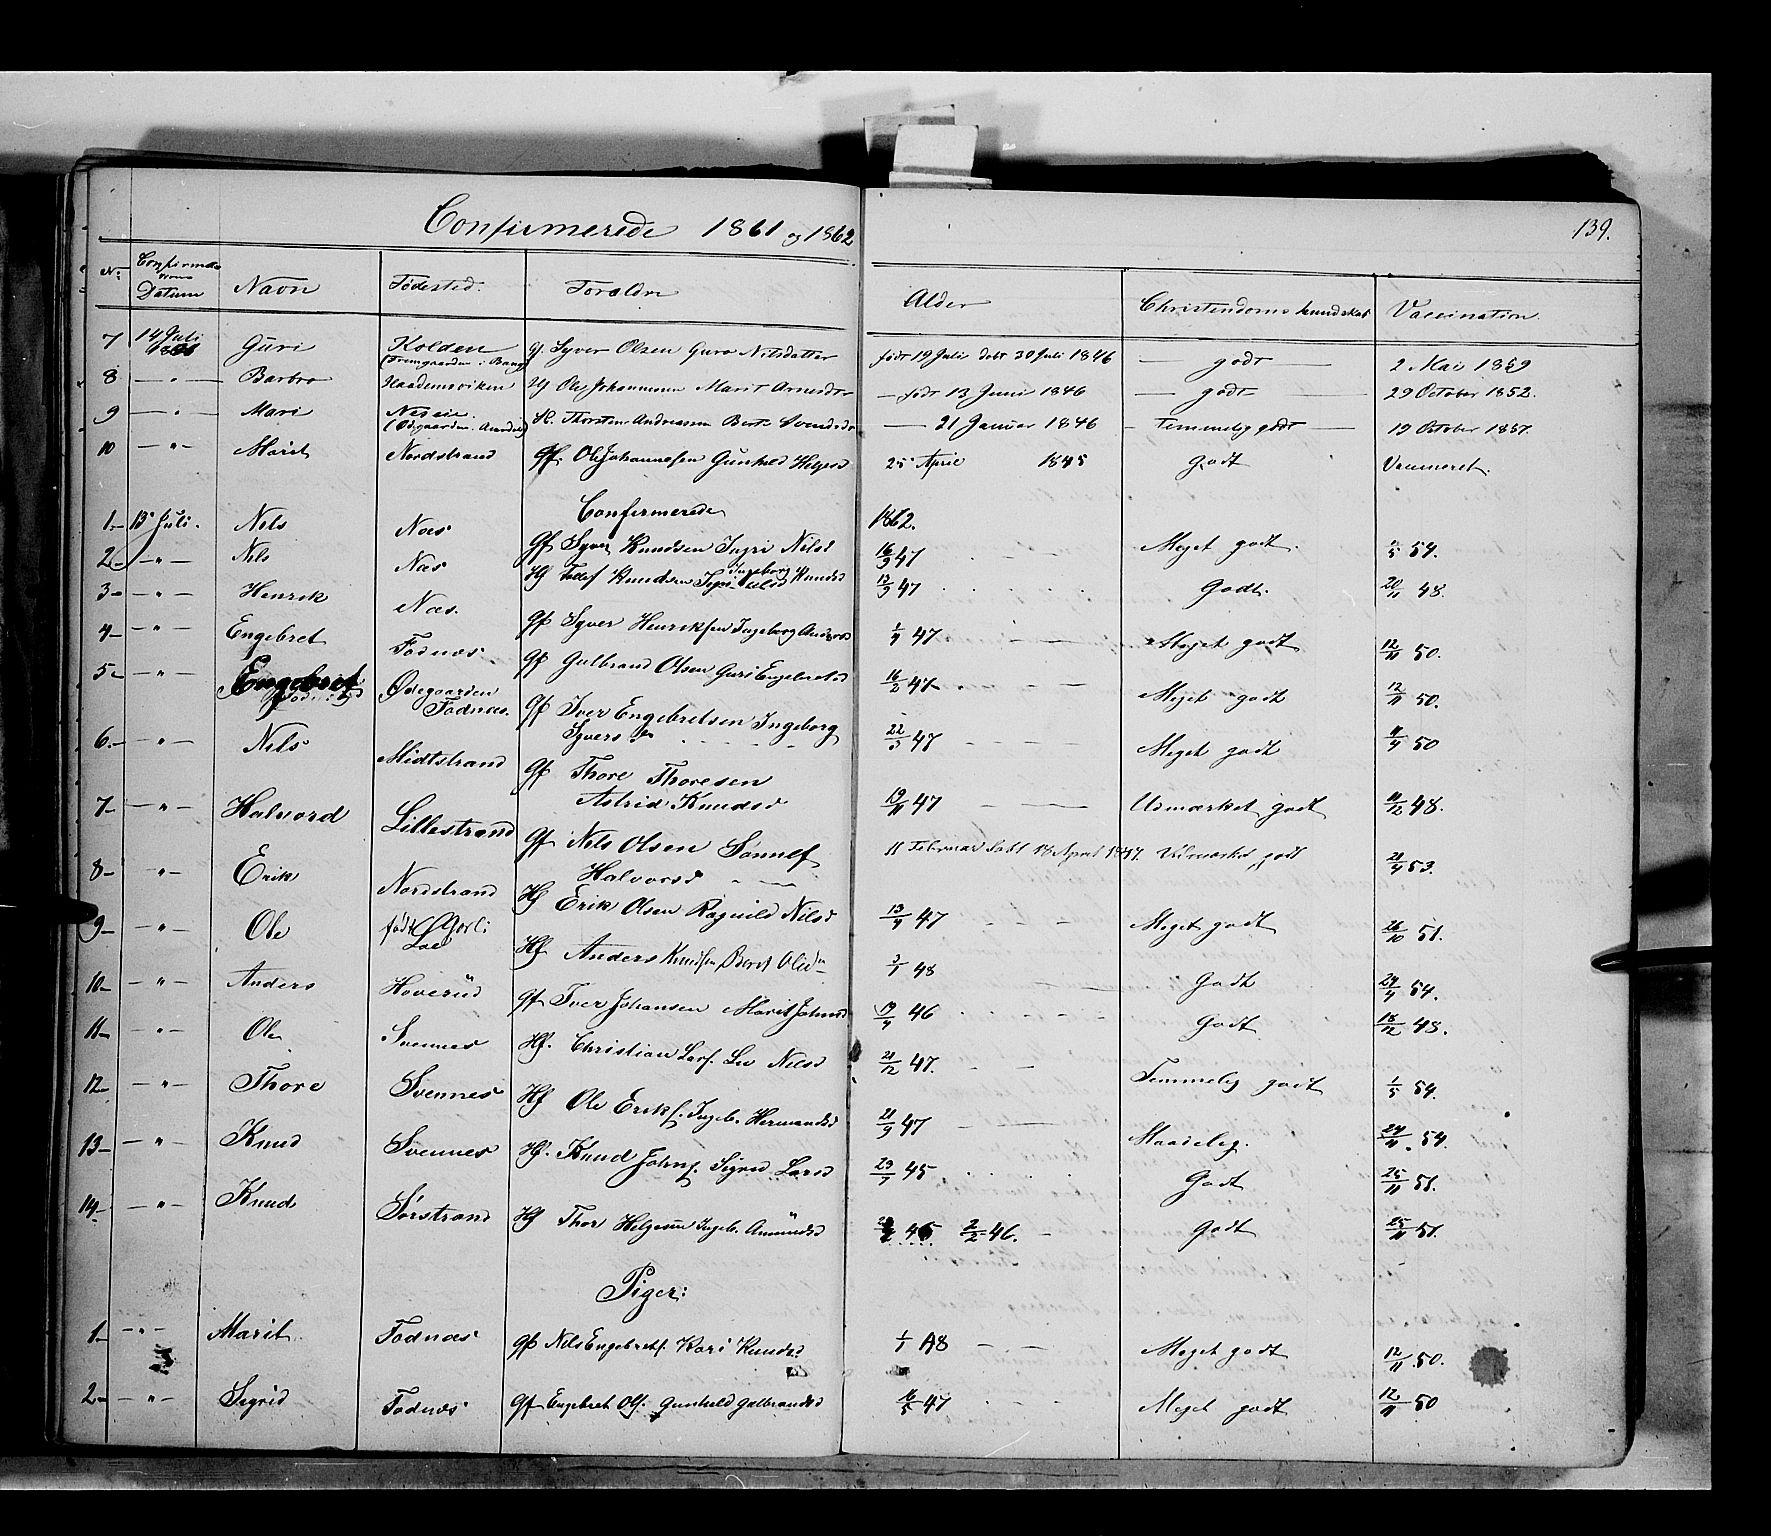 SAH, Nord-Aurdal prestekontor, Ministerialbok nr. 5, 1842-1863, s. 139